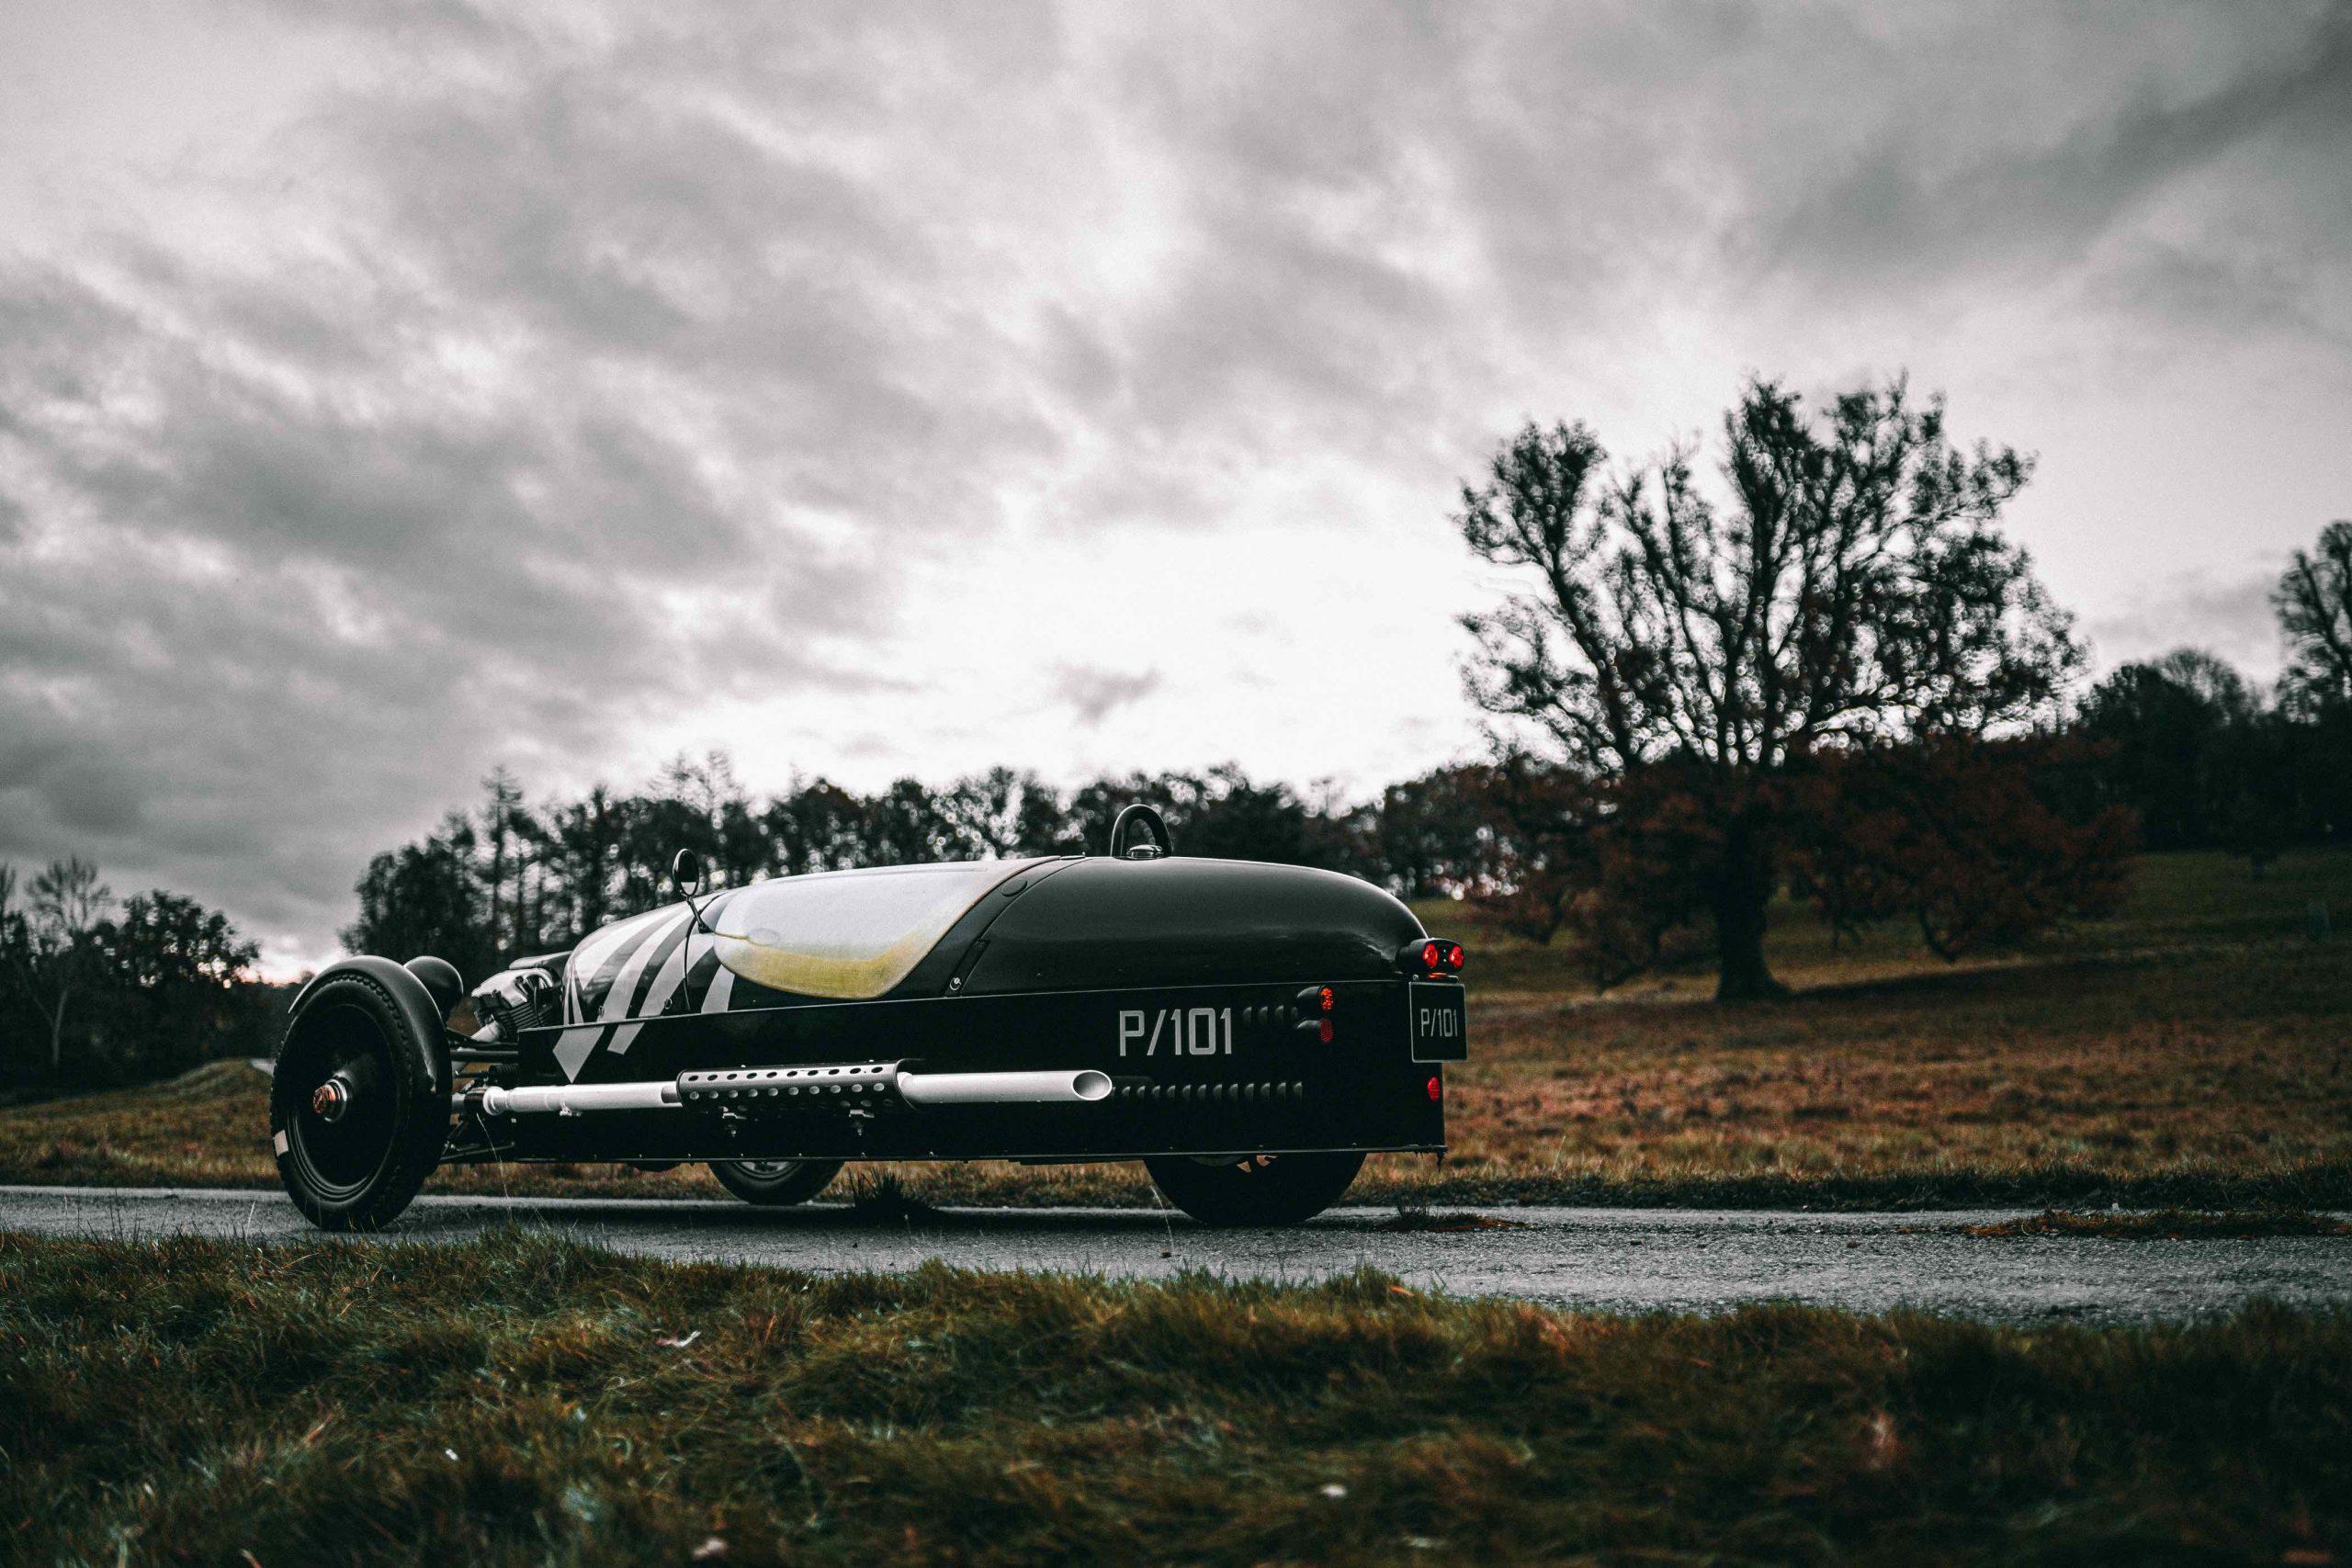 Morgan P101 three wheel rear three-quarter